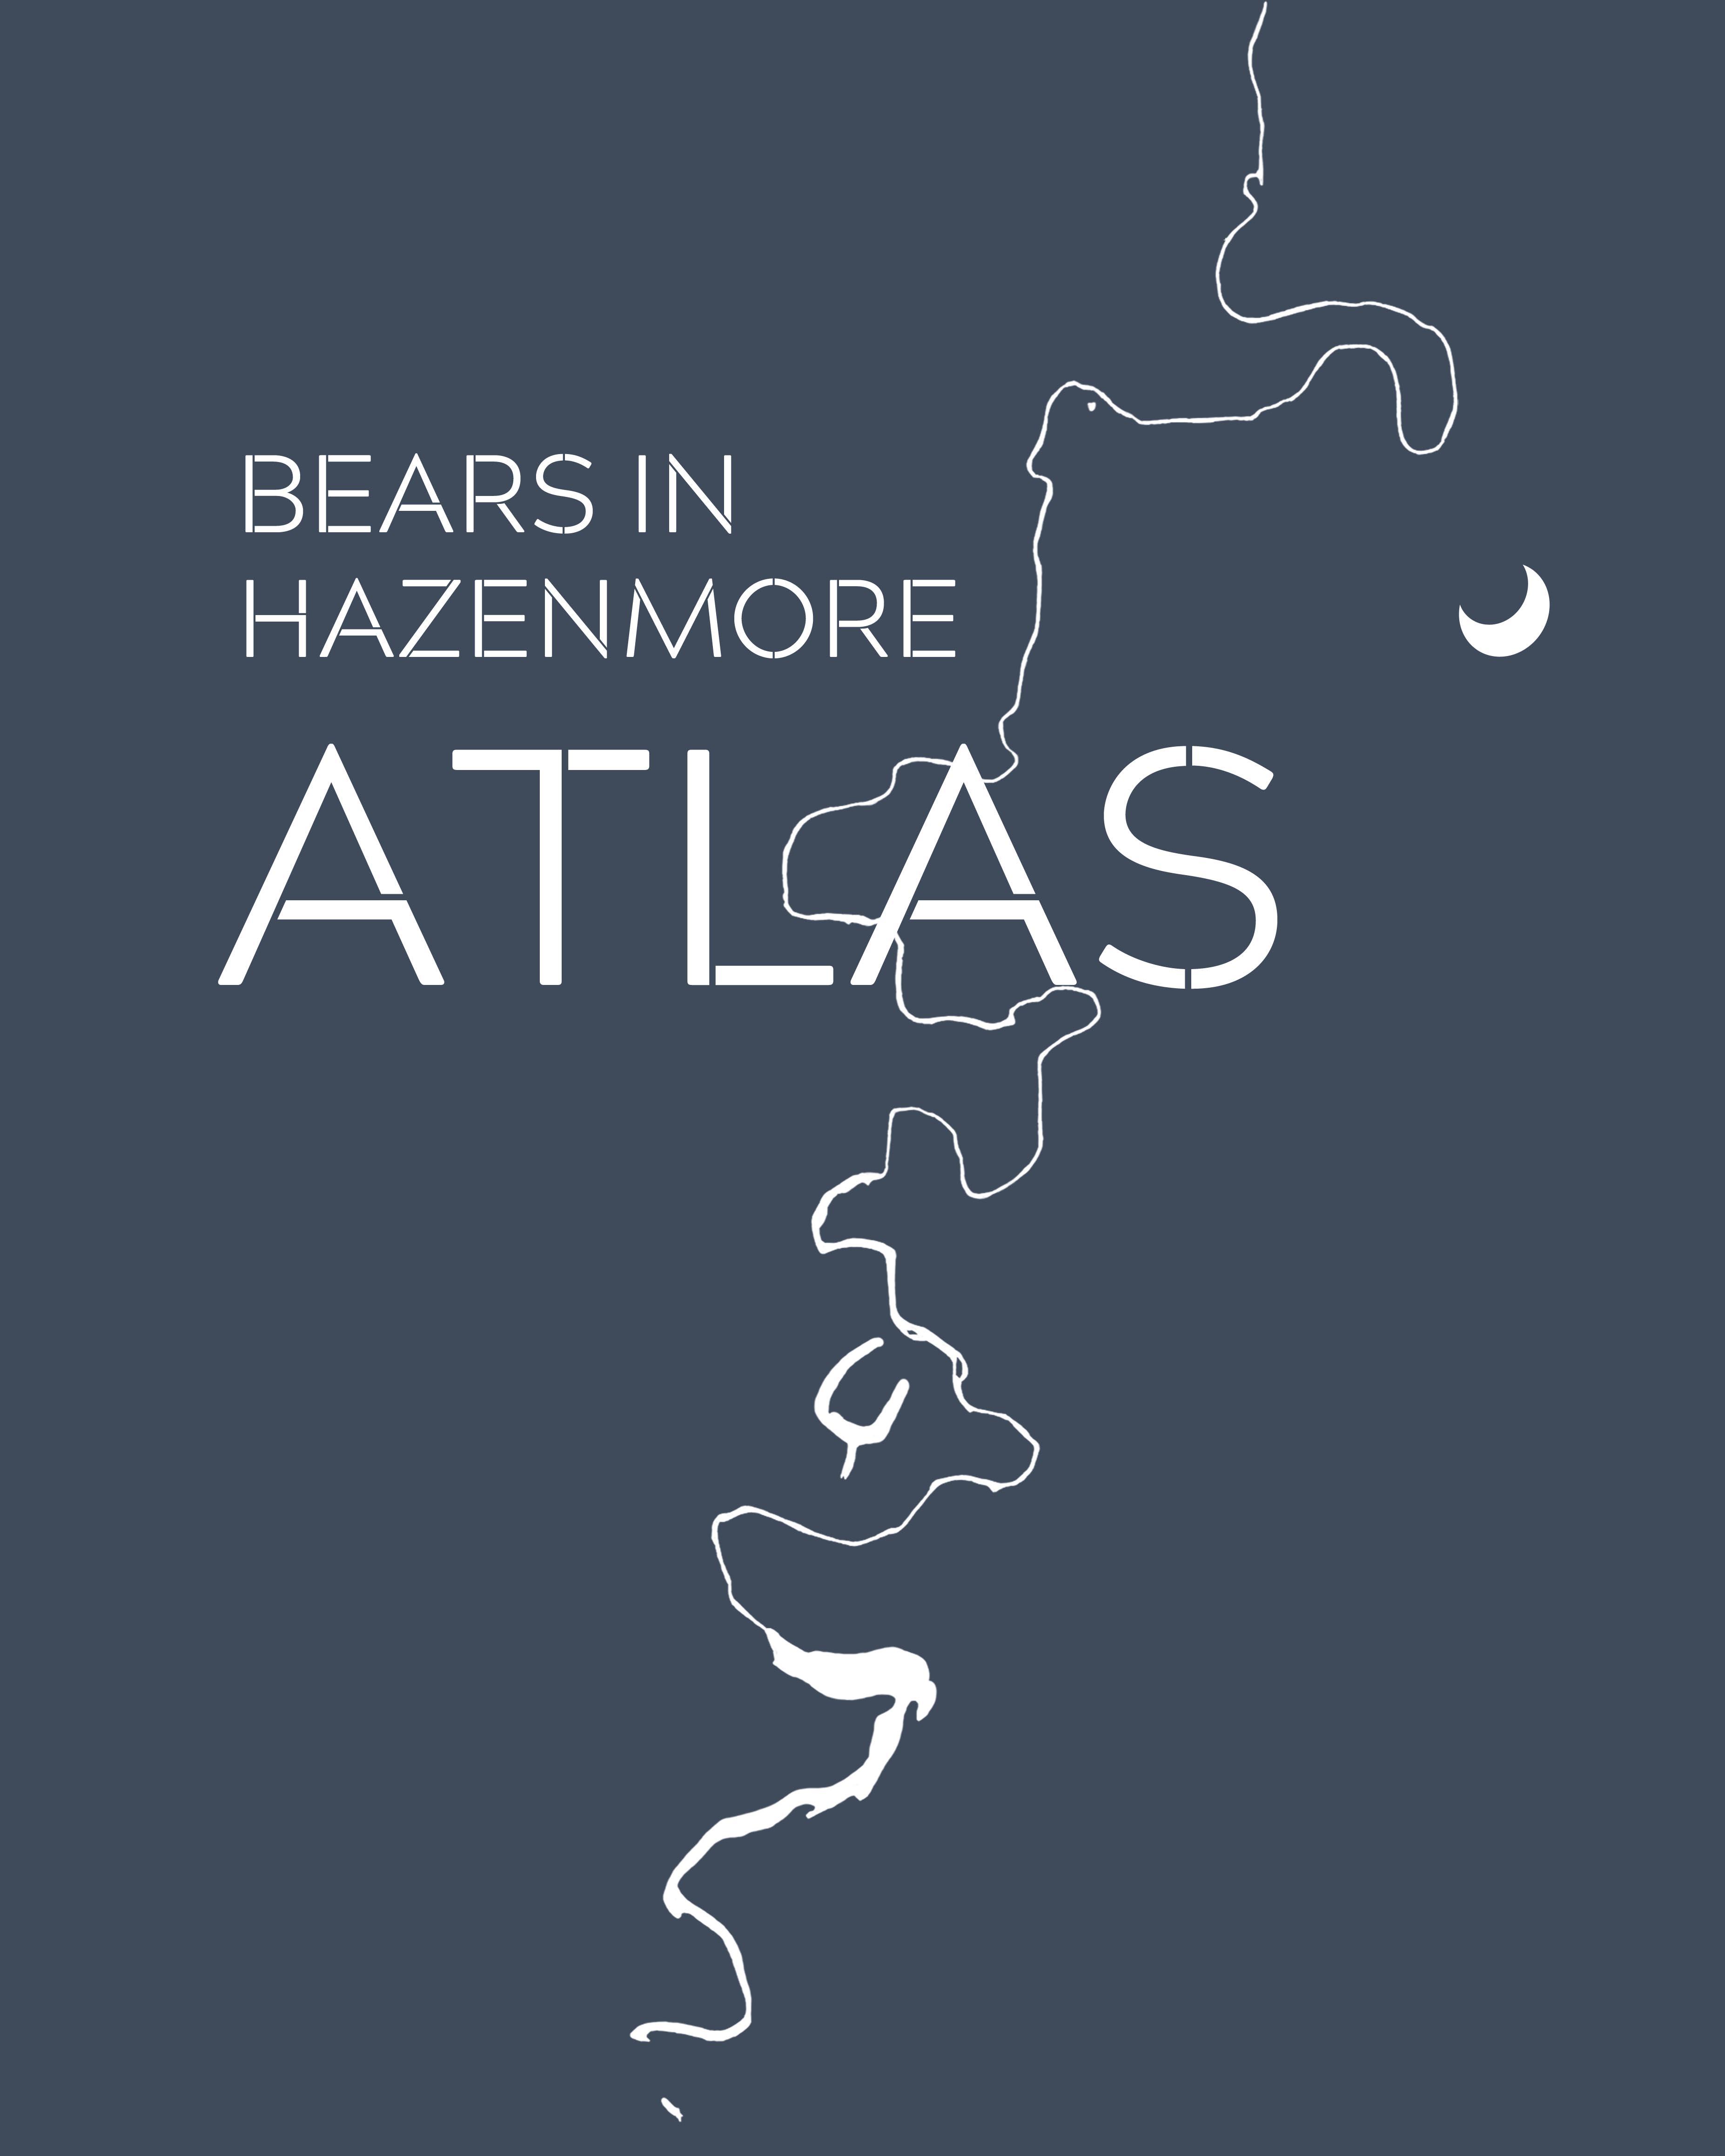 BIH Atlas Album Release Shirt Design